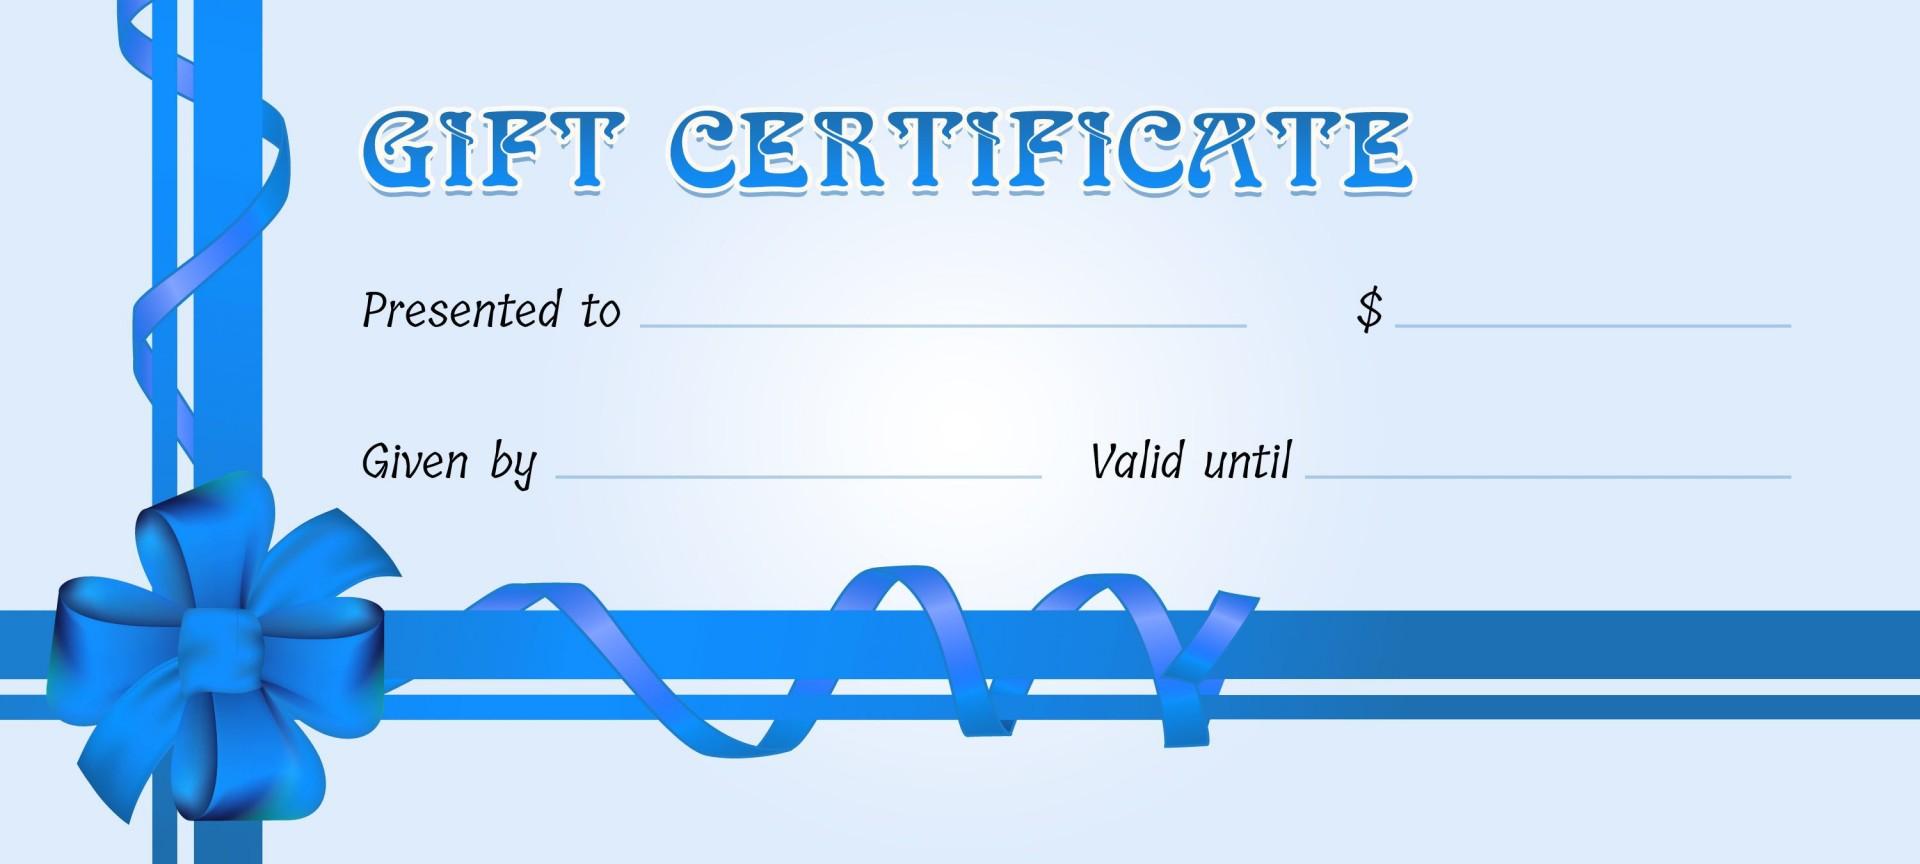 005 Astounding Gift Card Template Word Image  Restaurant Free Microsoft1920